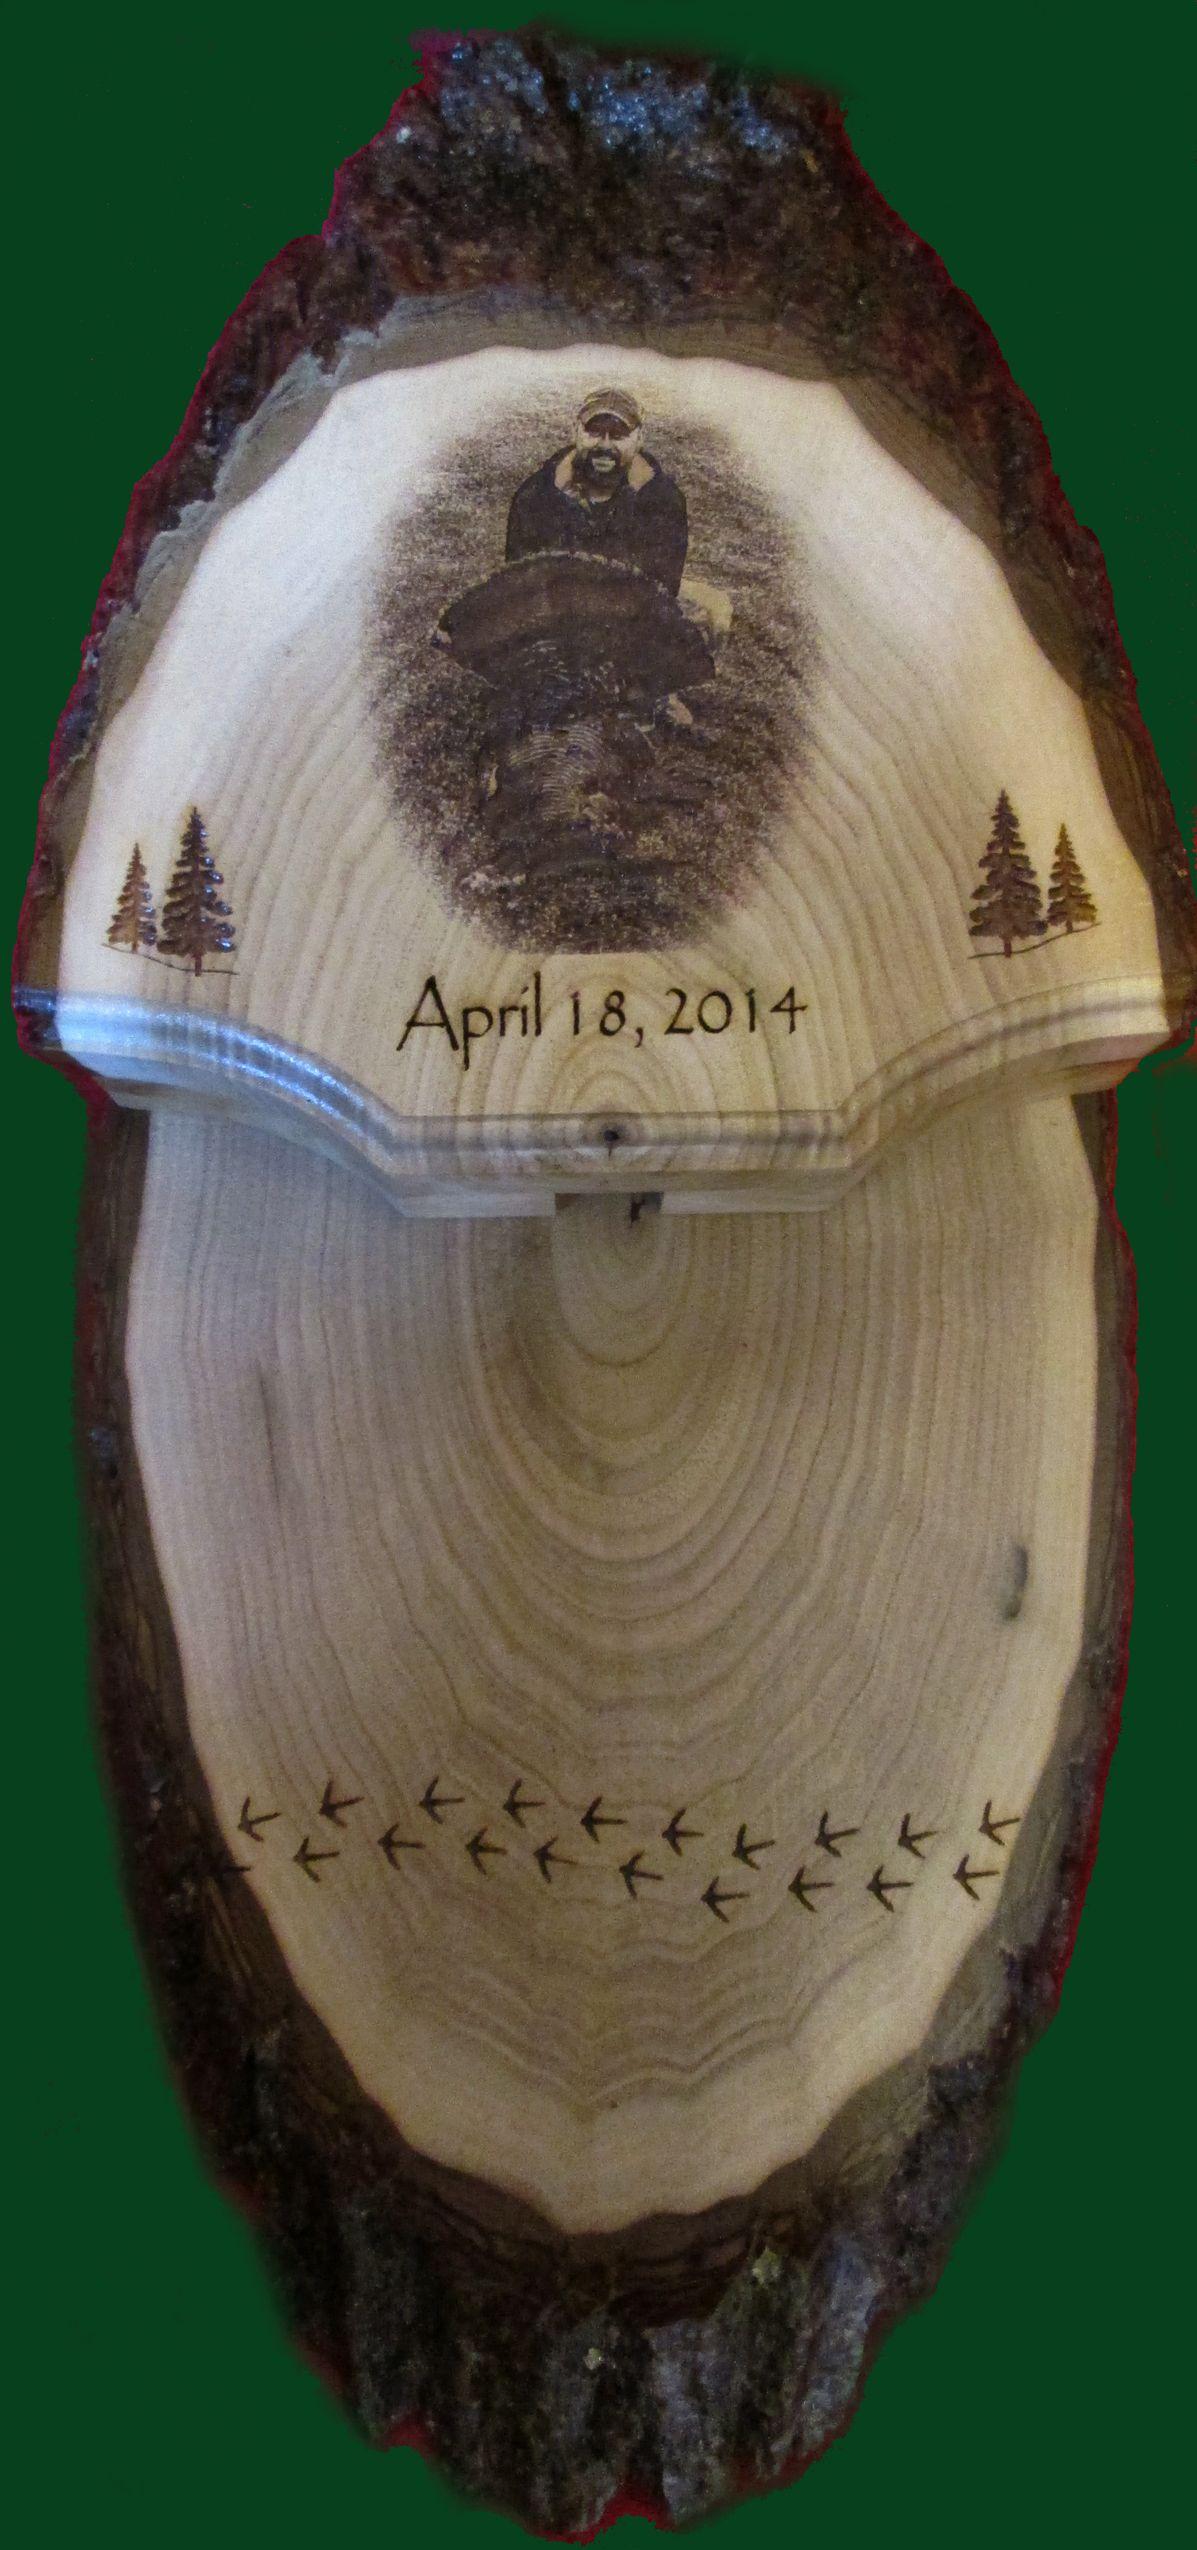 A wonderful way to display your turkey fan and beard send